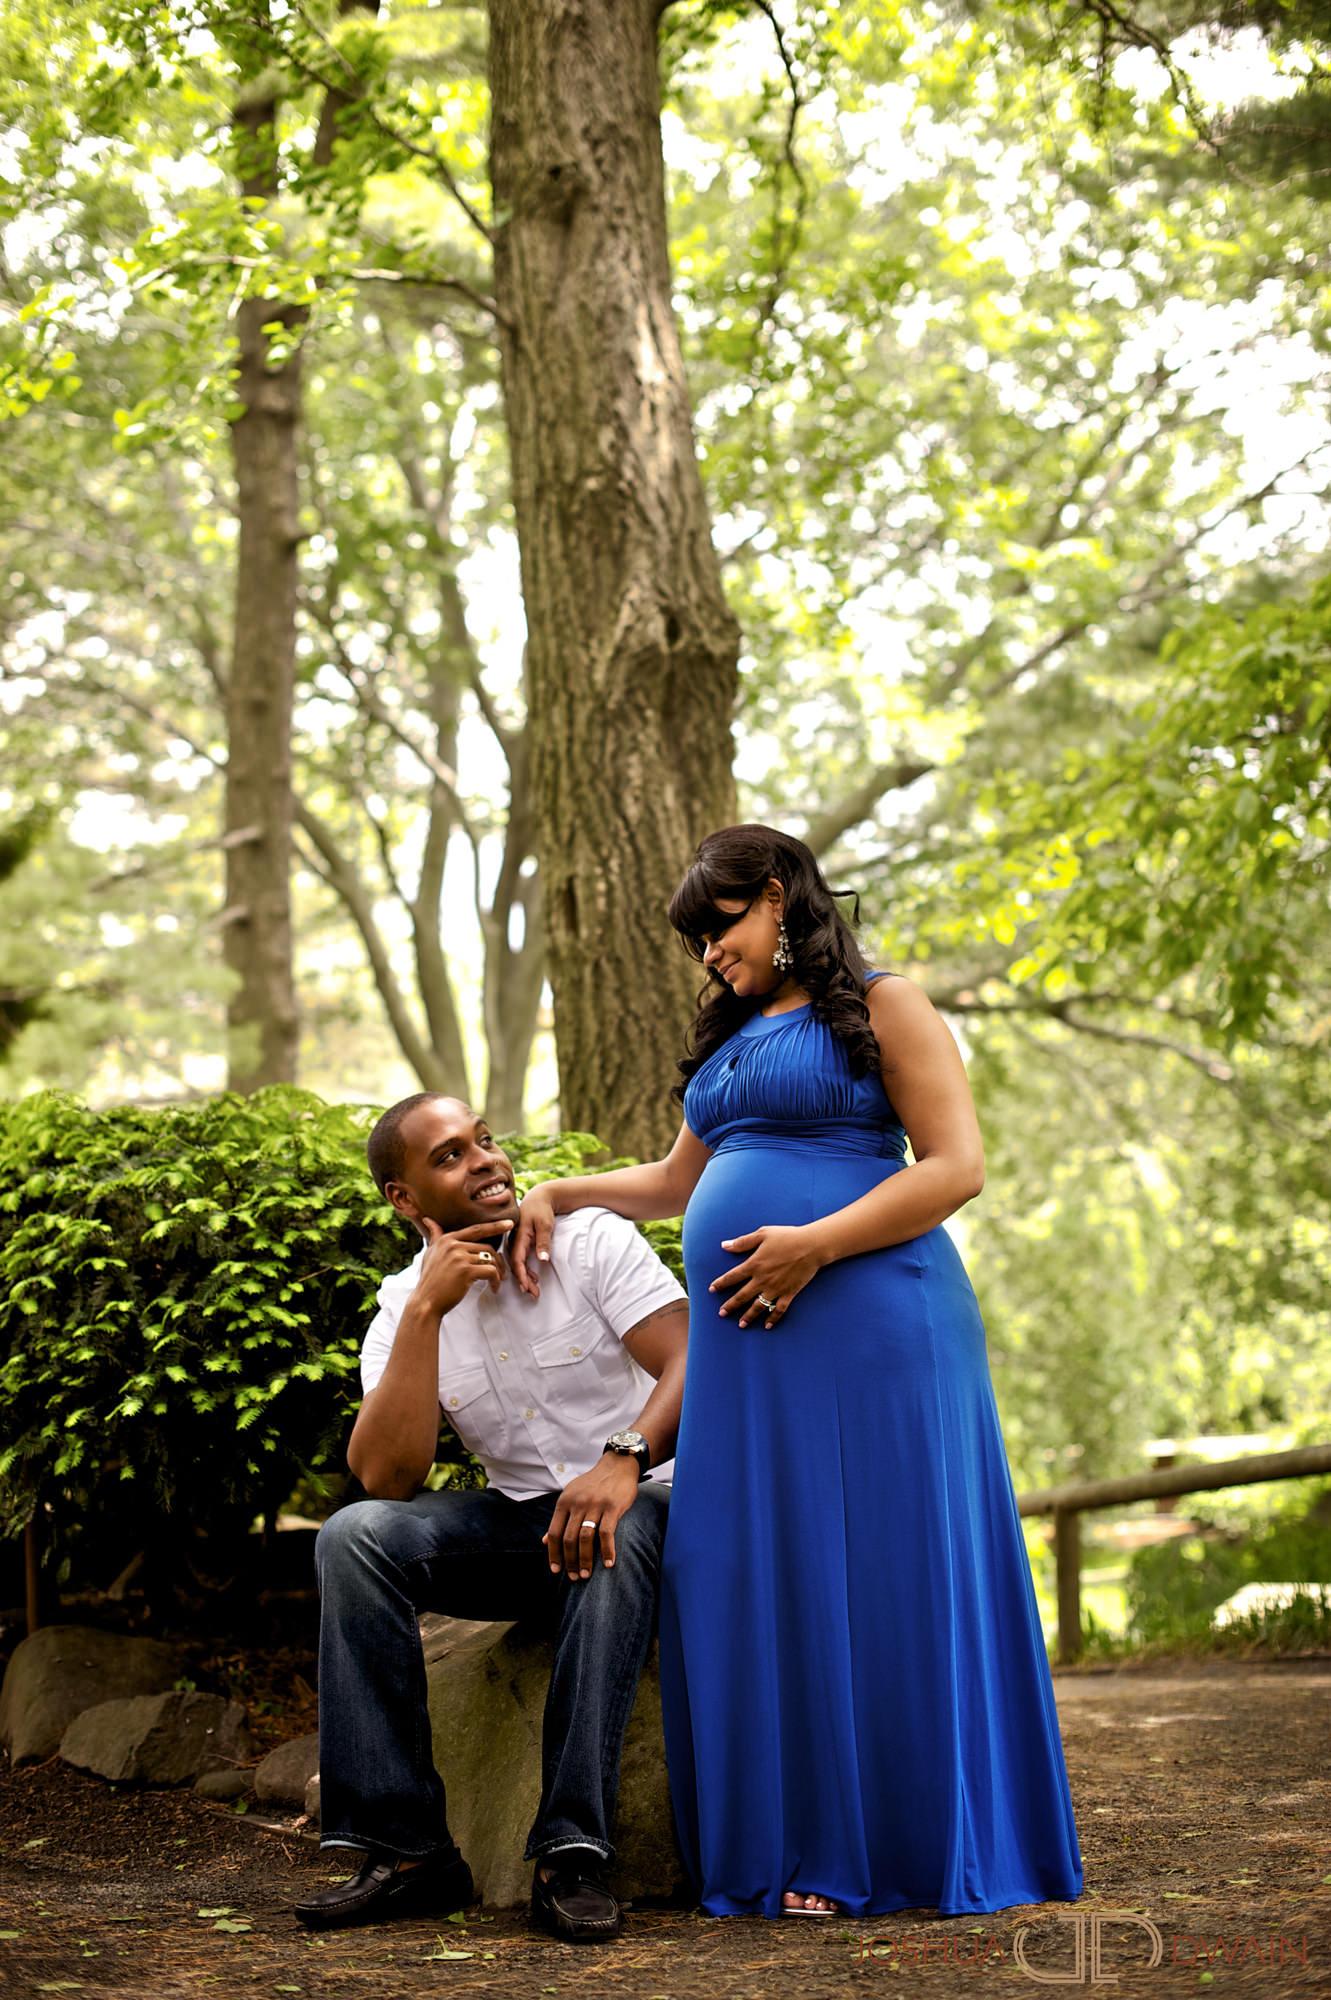 aysha-richard-006-botanical-gardensbrooklyn-ny-portrait-photographer-joshua-dwain-2011-05-21_ar_046